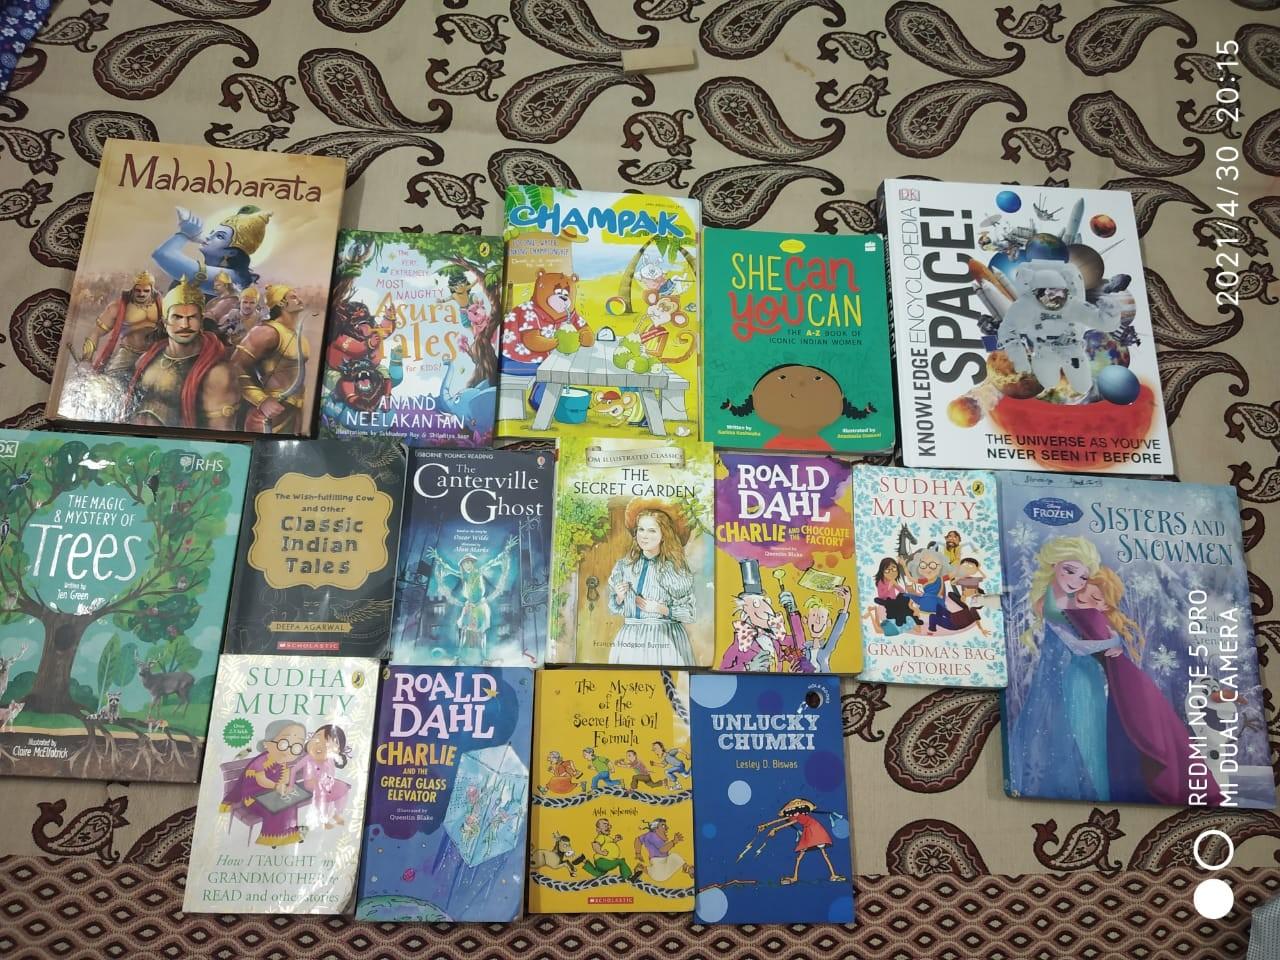 Shranya's Reading Suggestions for 7-10 year olds. #kbcBookBingoSr